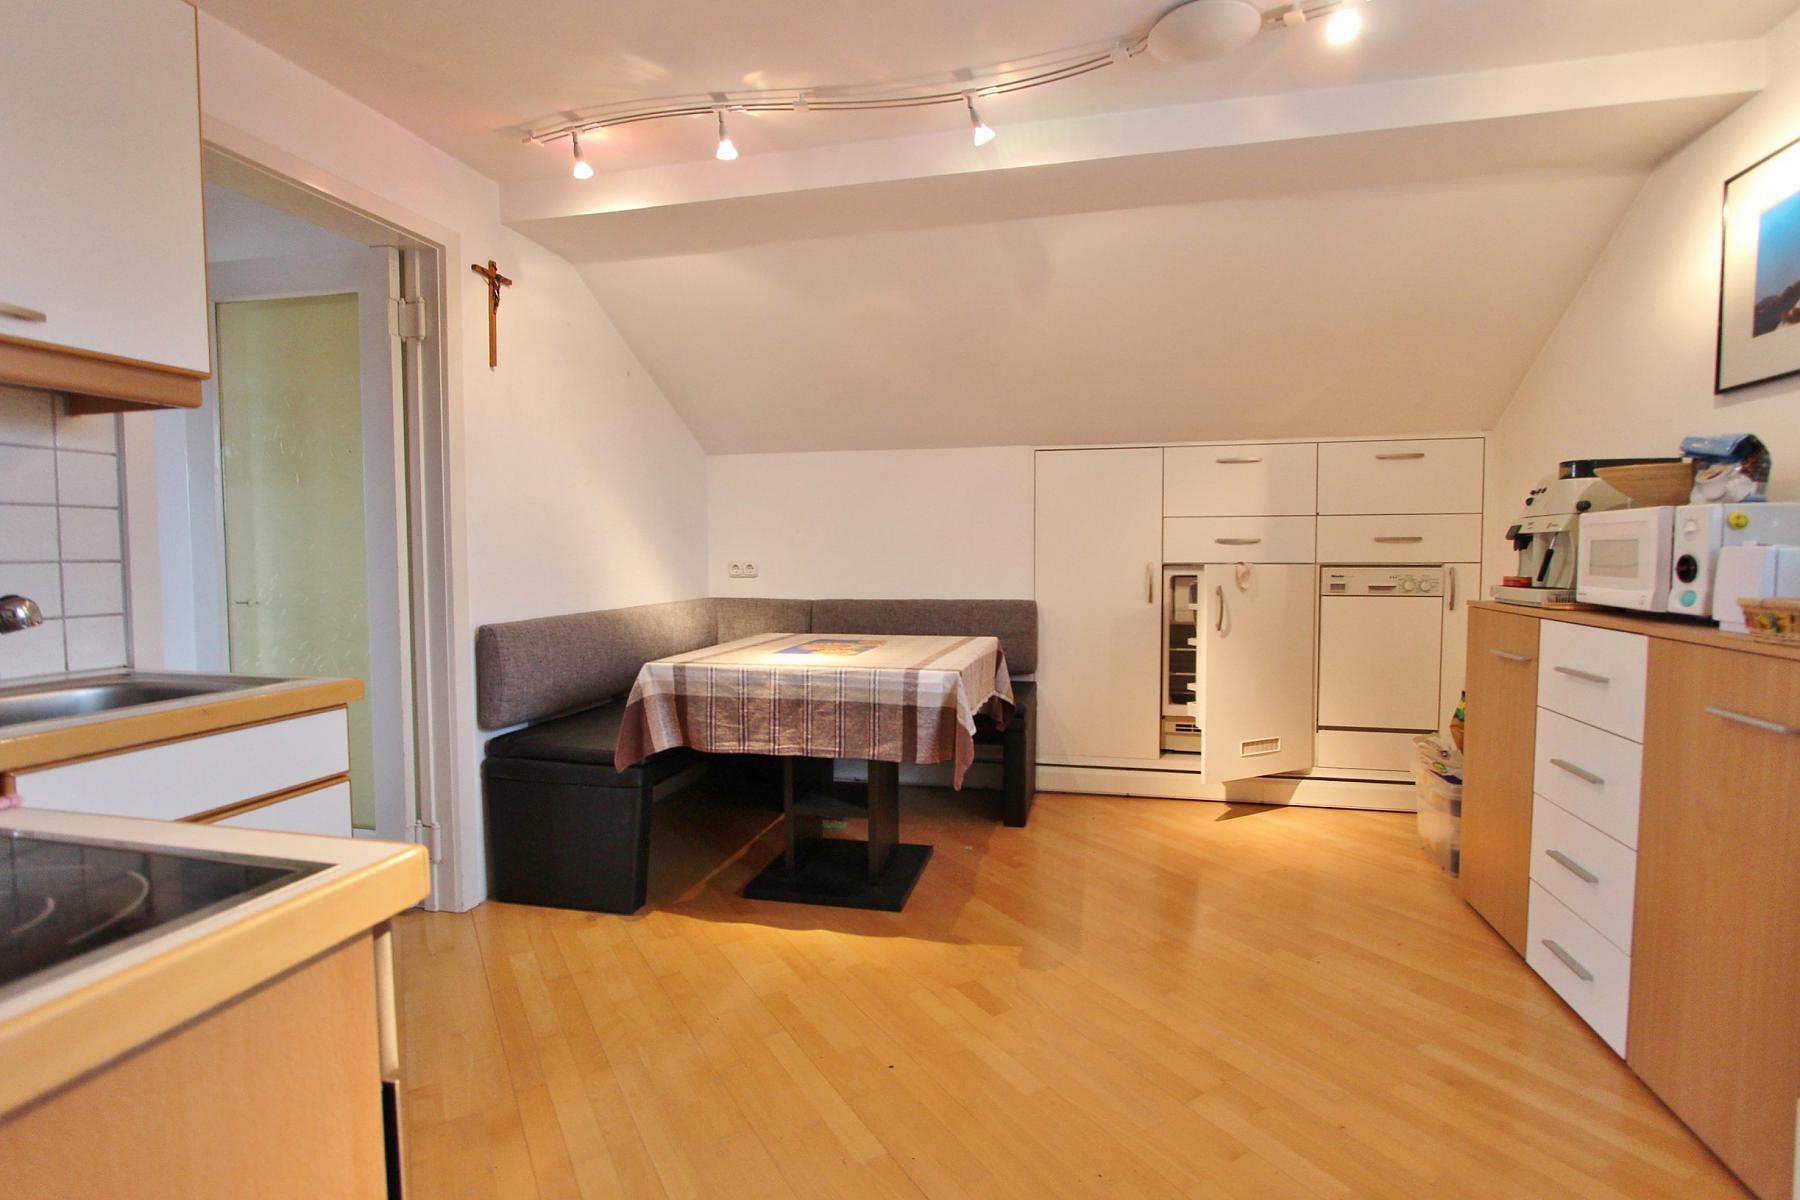 ein mehrfamilienhaus smart home bauconsulting gmbh. Black Bedroom Furniture Sets. Home Design Ideas